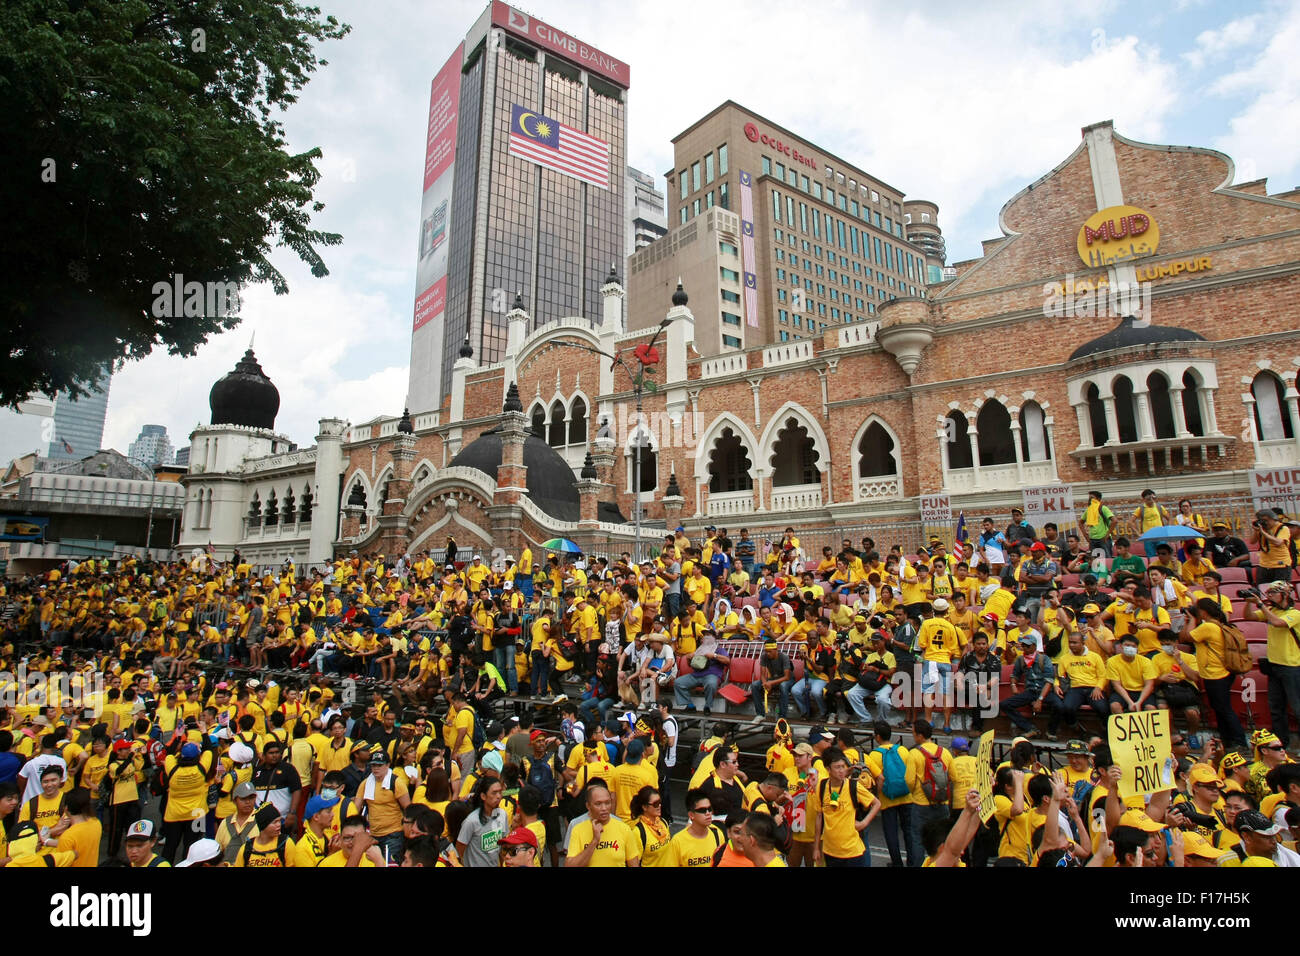 kl, kl, malaysia 29 august 2015 demonstrant bersih 4 0 versammeln